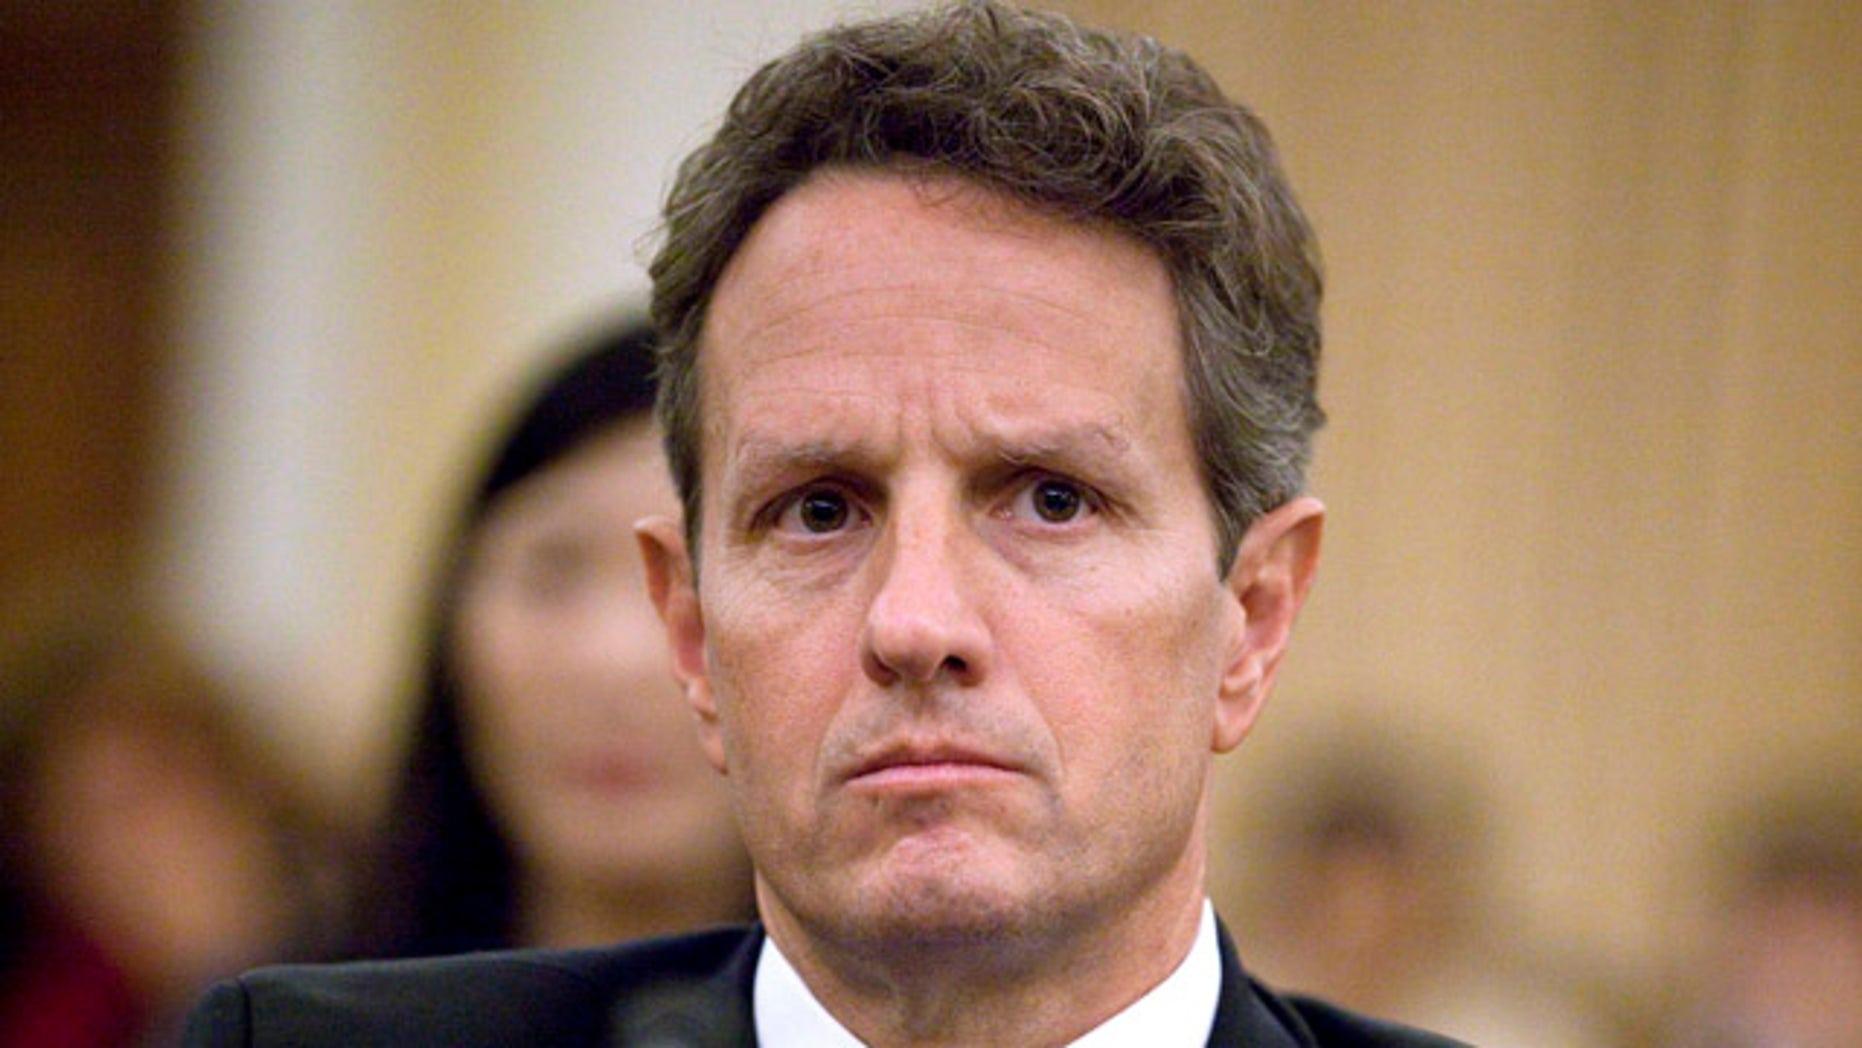 FILE: Sept. 16, 2010: Treasury Secretary Timothy Geithner testifies on Capitol Hill in Washington.